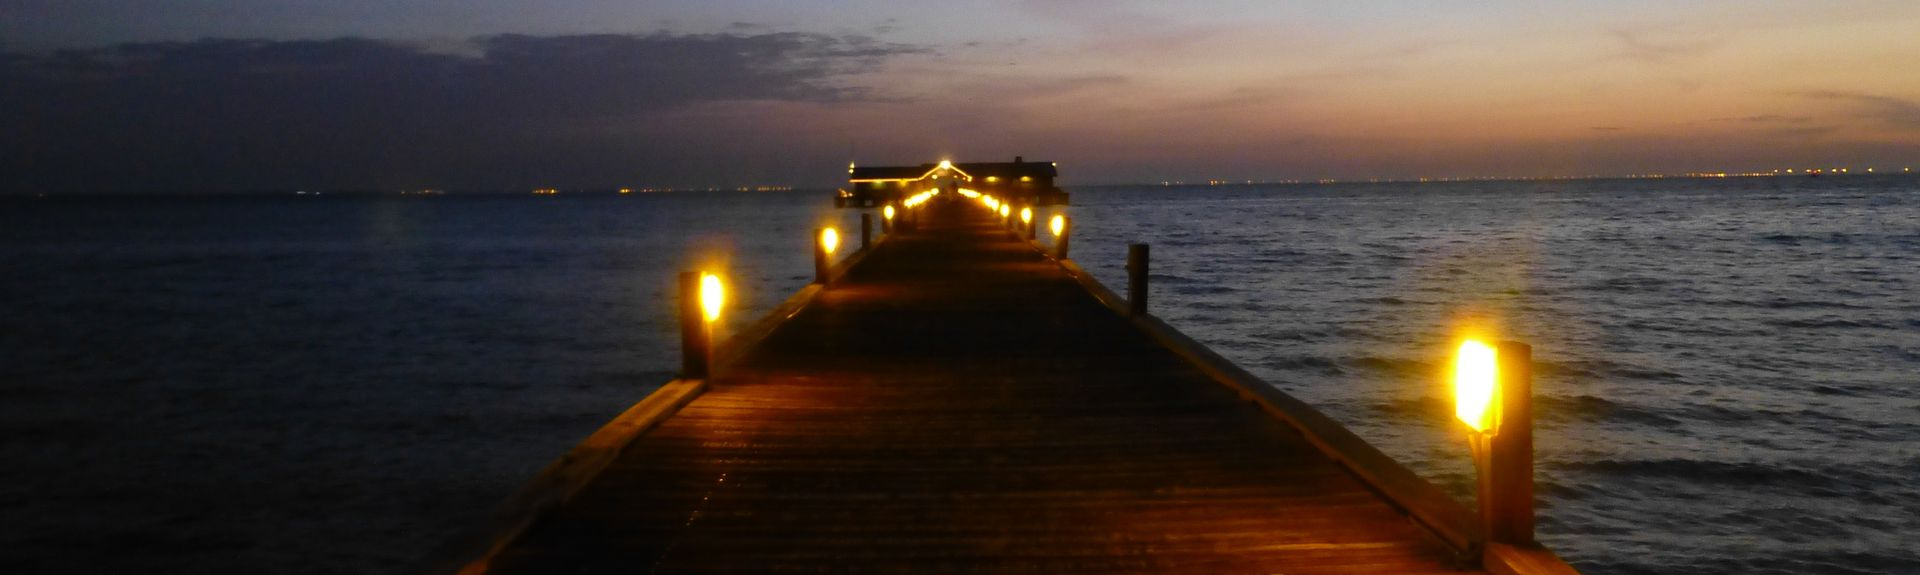 Snead Island, Palmetto, Florida, USA